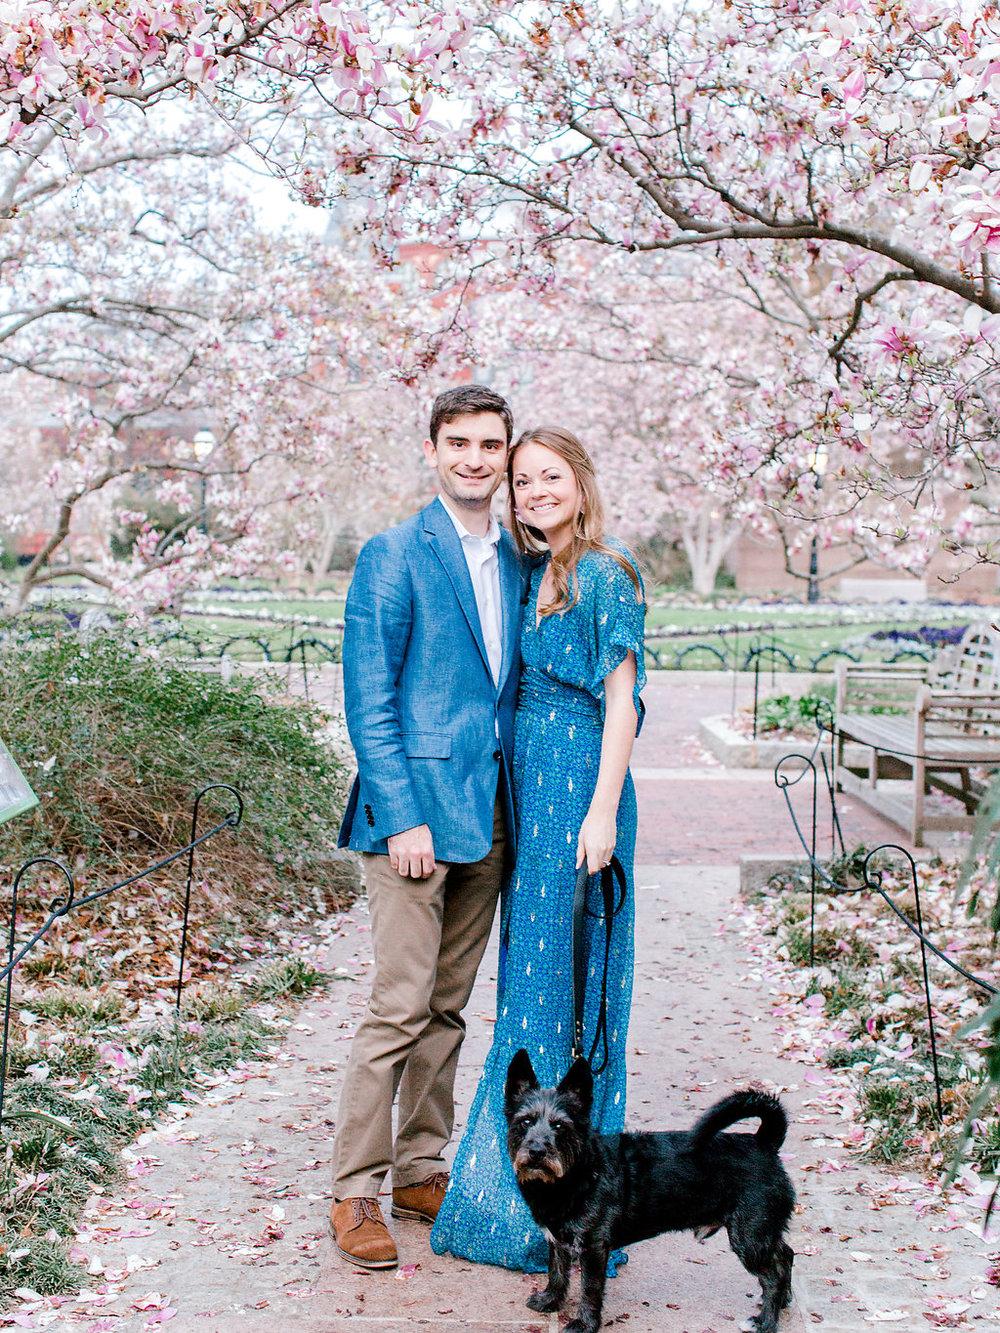 Washington D.C. Cherry Blossom Engagement | Andrea Rodway Photog